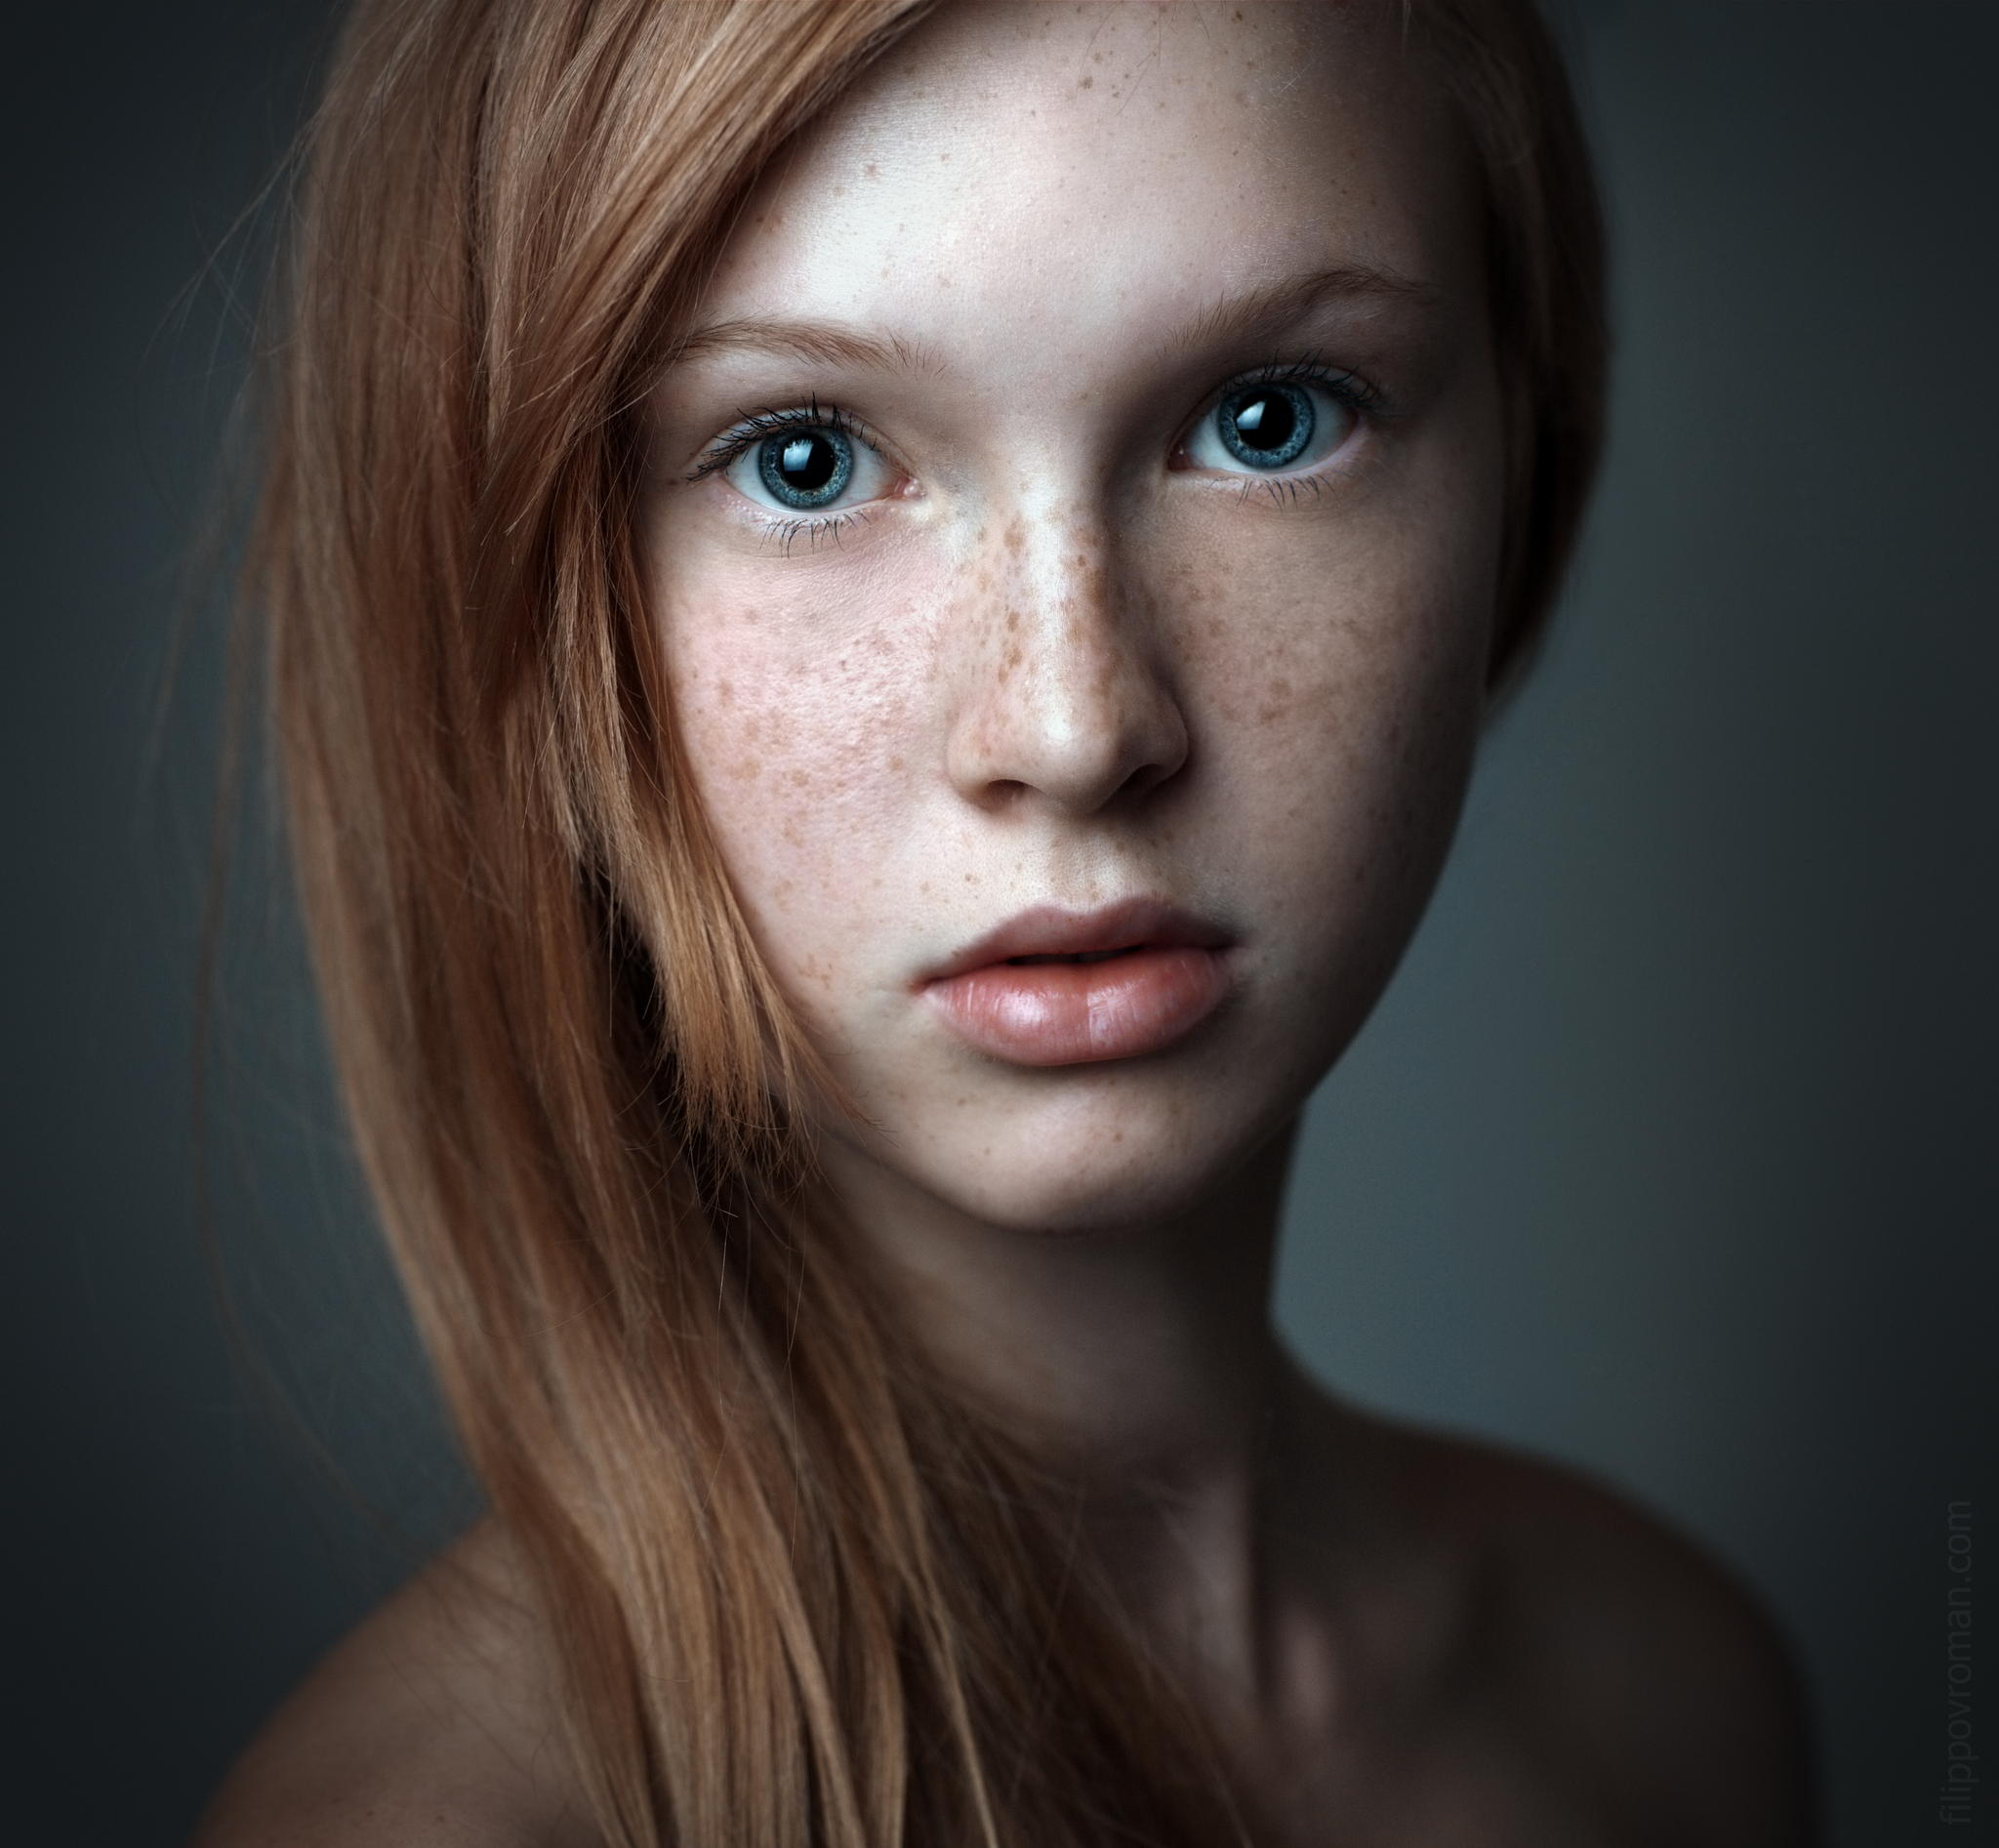 2048x1893px Portrait 250.21 KB #309101